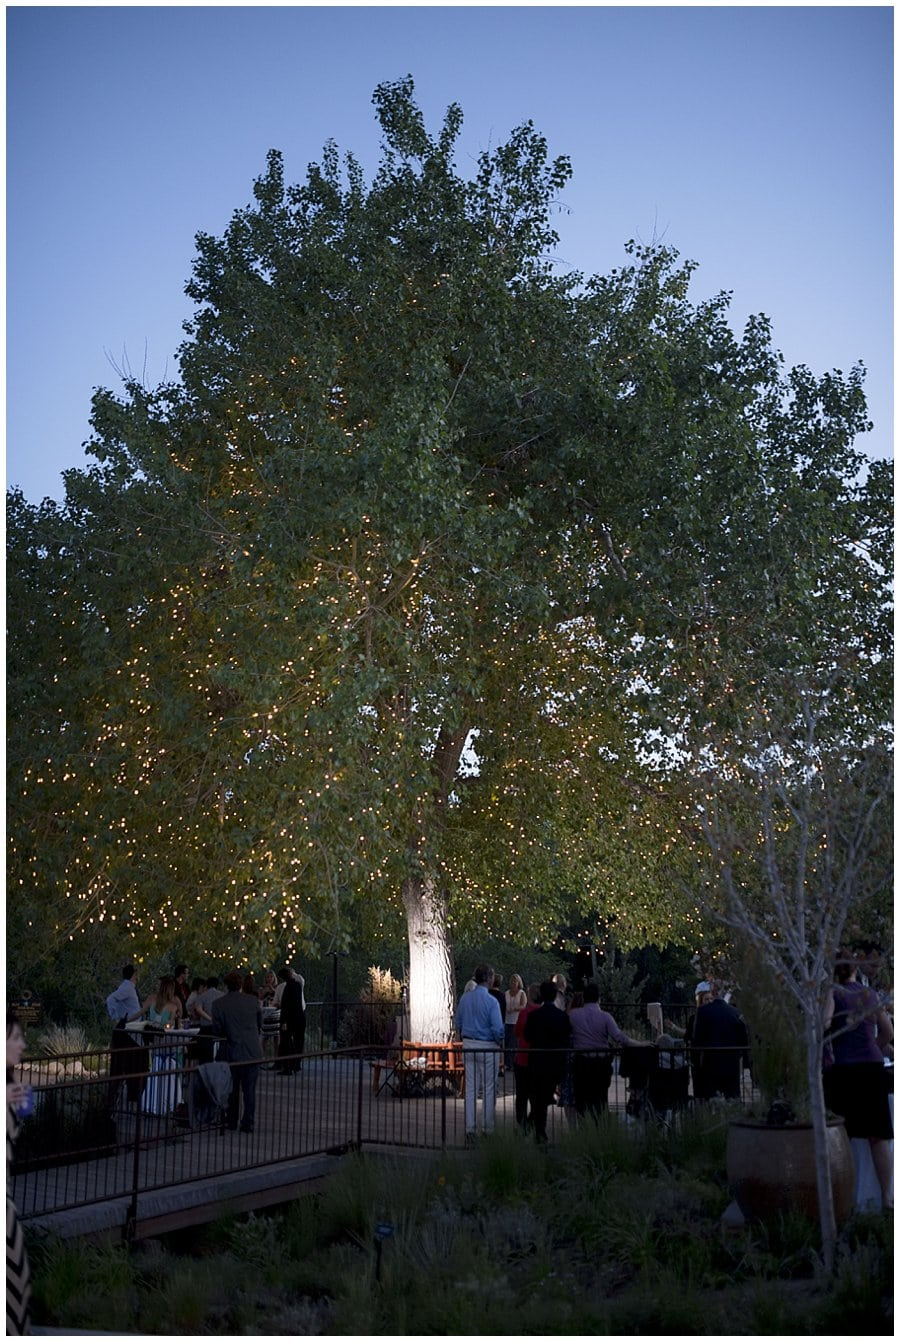 Denver Botanic Gardens at Chatfield Prairie Canopy Reception Photo 2